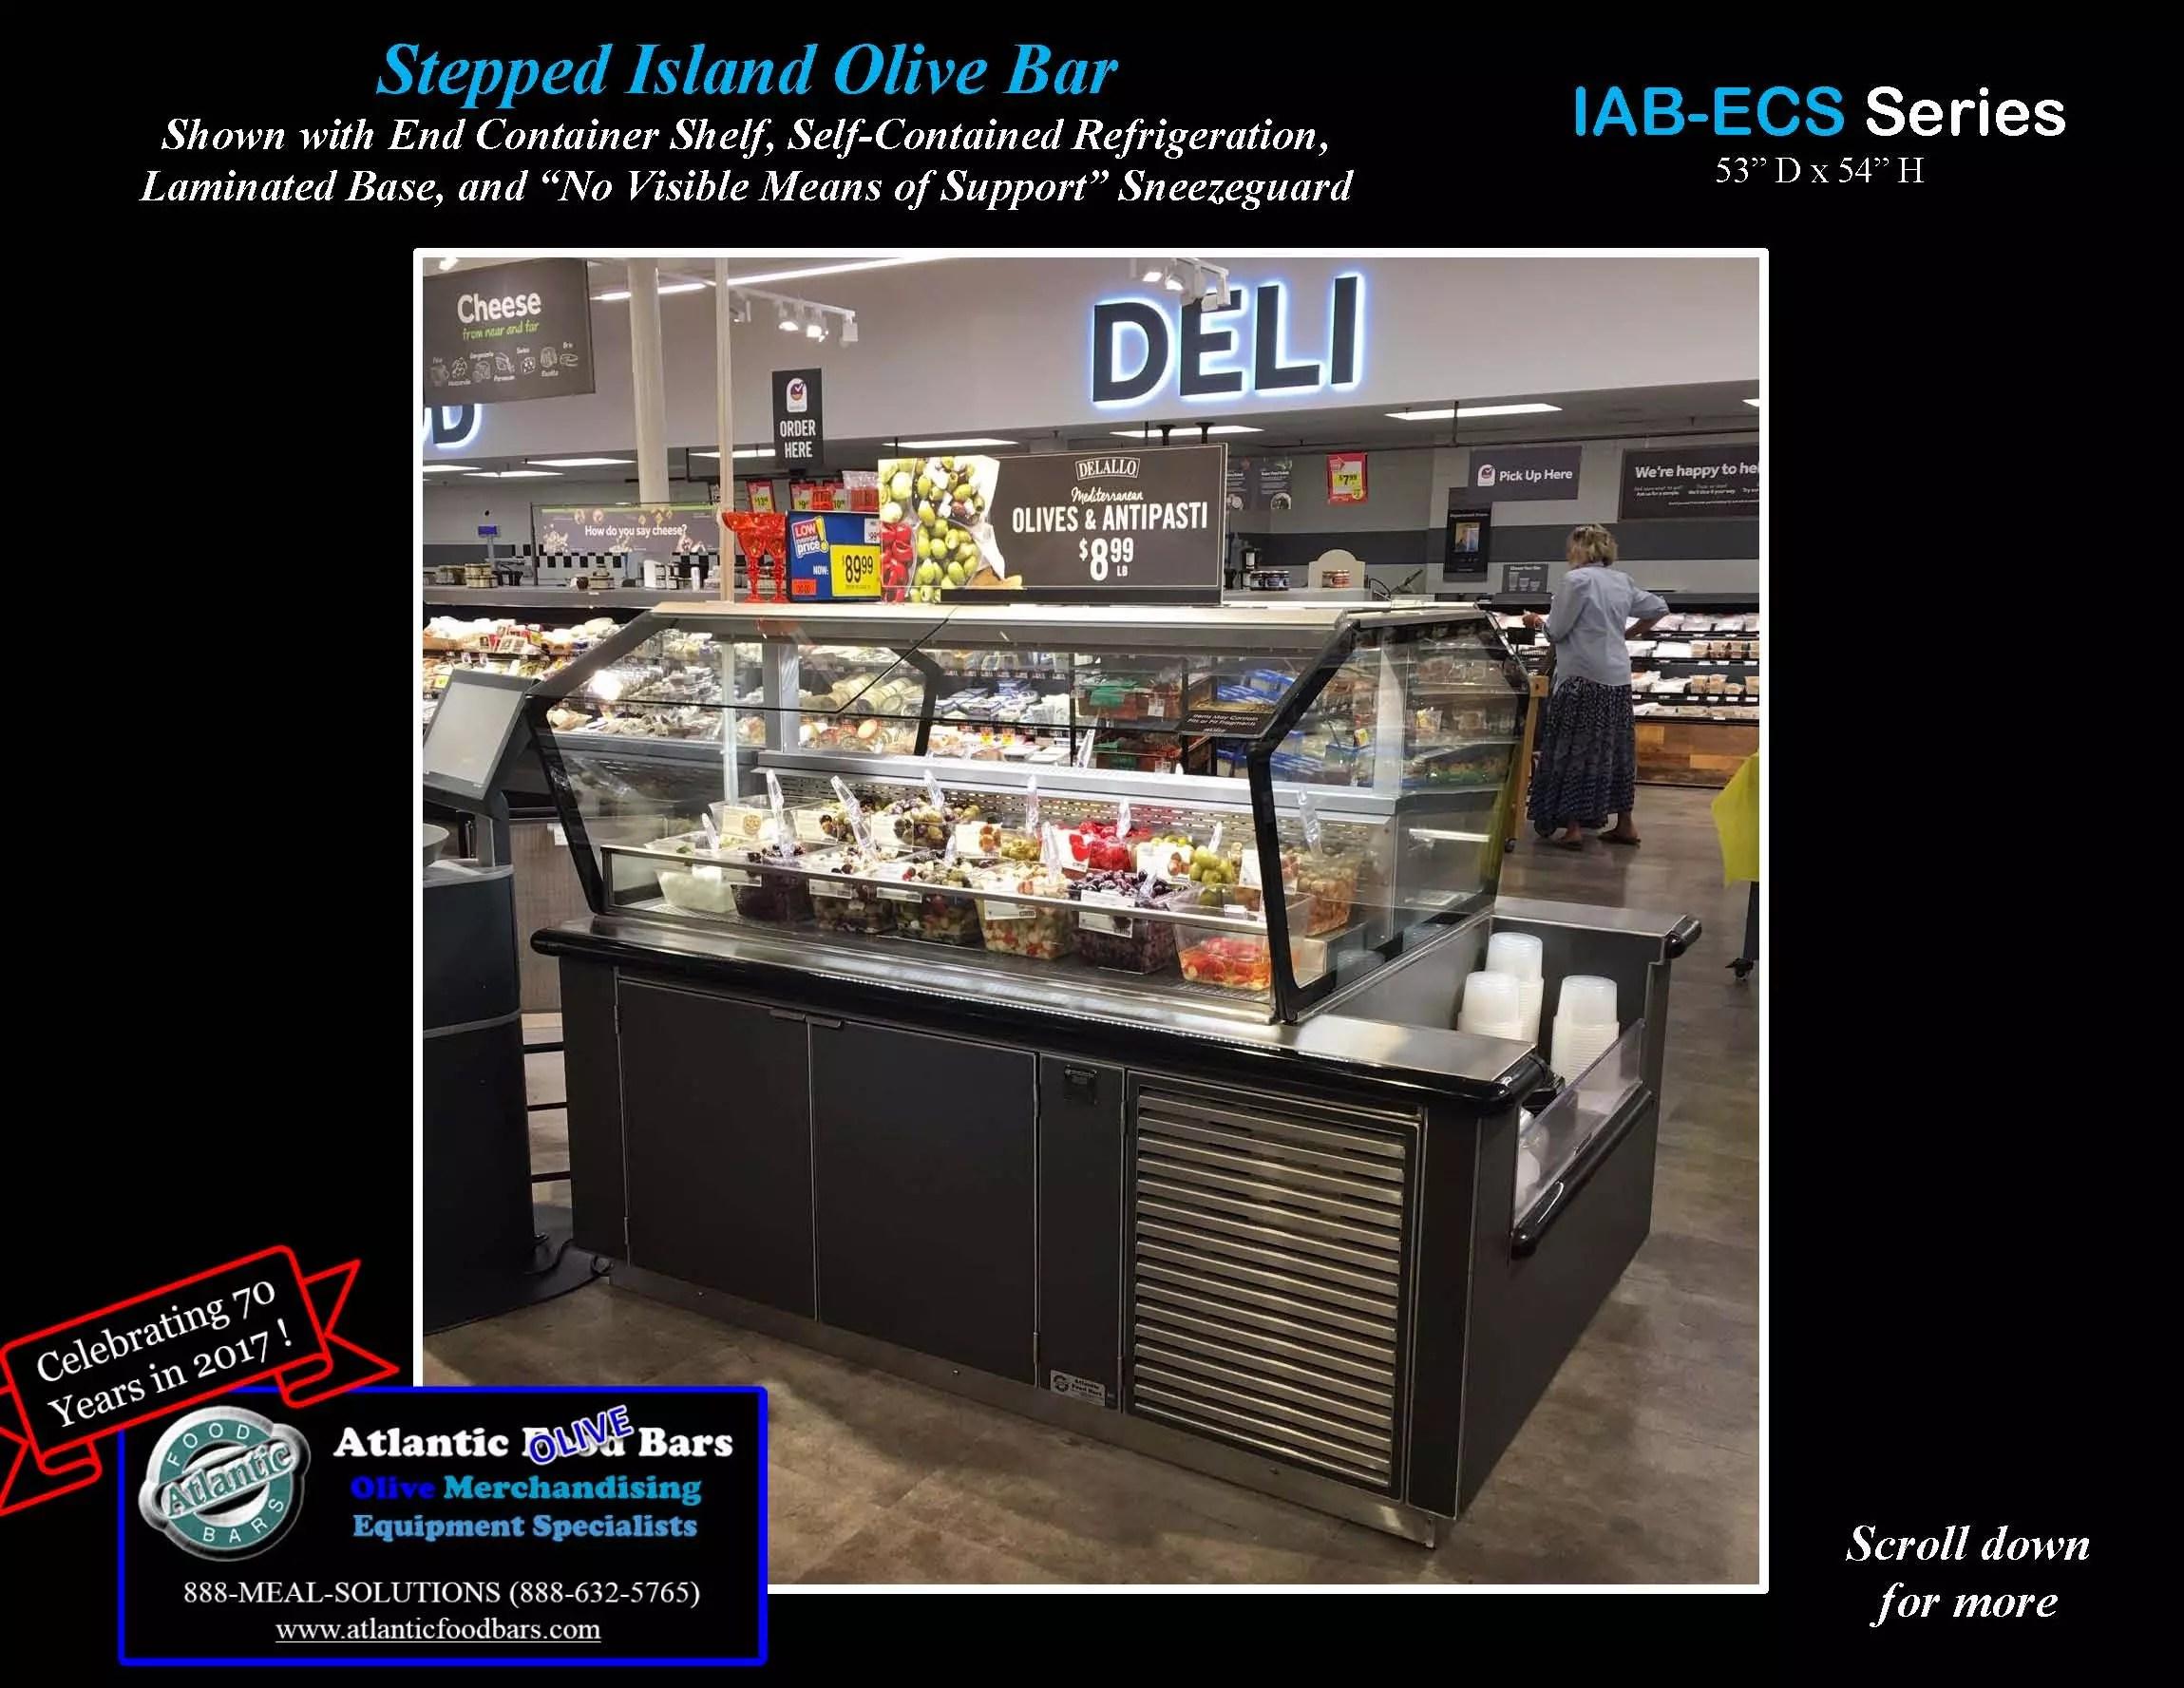 Atlantic Food Bars - Stepped Refrigerated Island Olive Bar - IAB5851-ECS-LB-SC-VH_Page_1